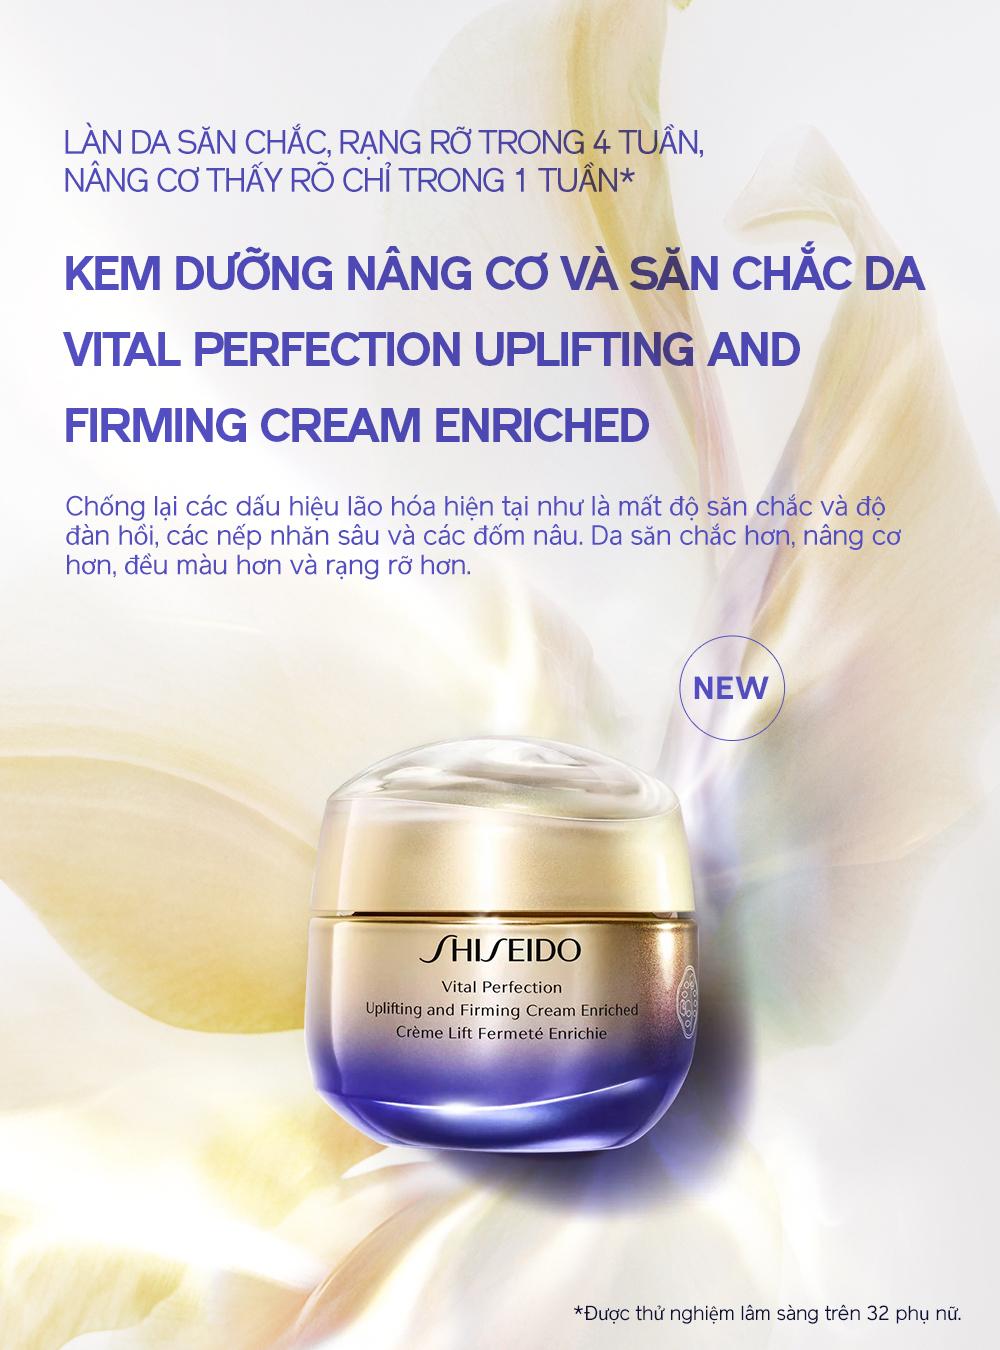 Kem dưỡng da Shiseido Vital Perfection Uplifting and Firming Cream Enriched  20ml   Lazada.vn